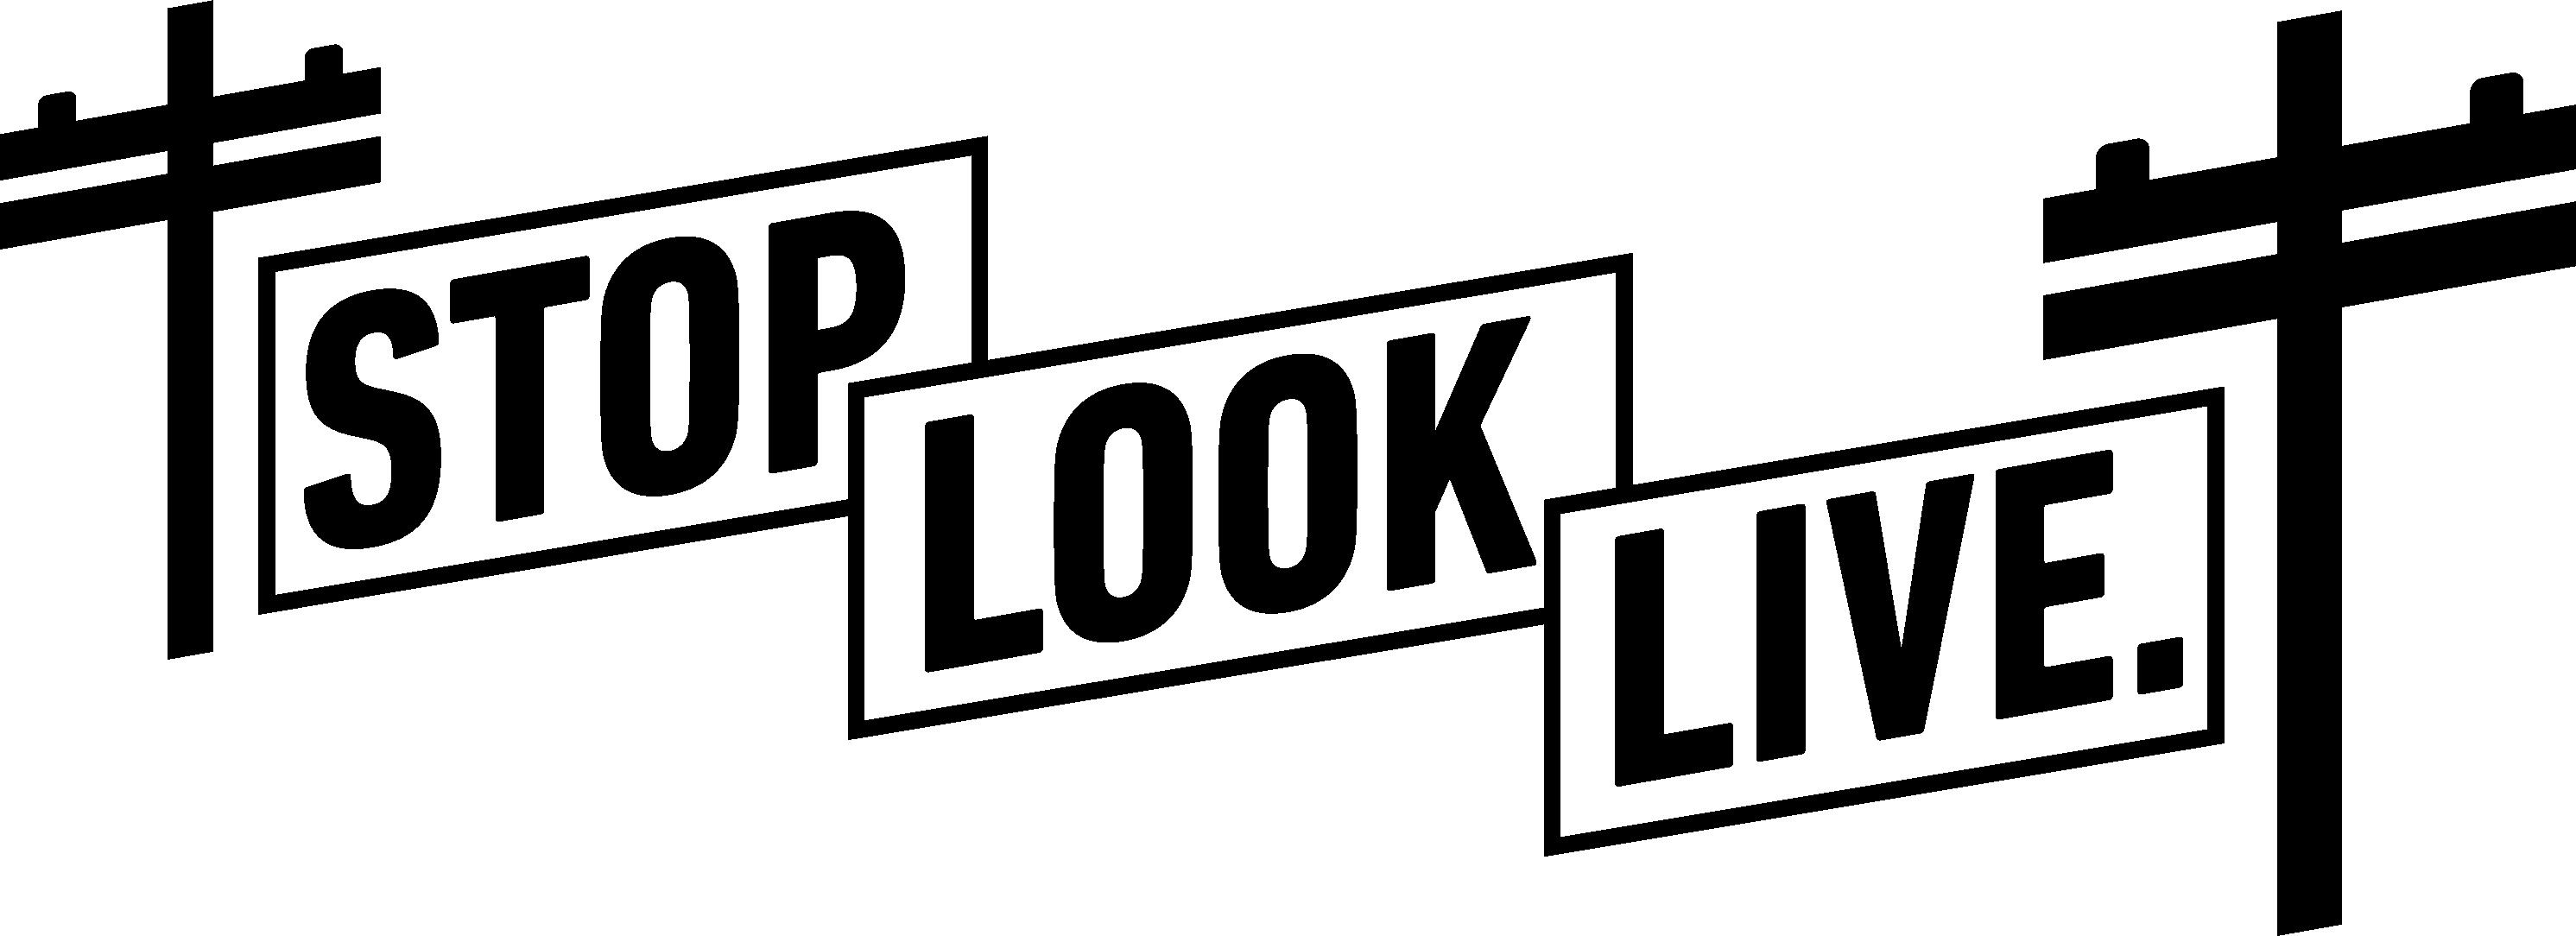 ESA-CampaignWordmark-Black